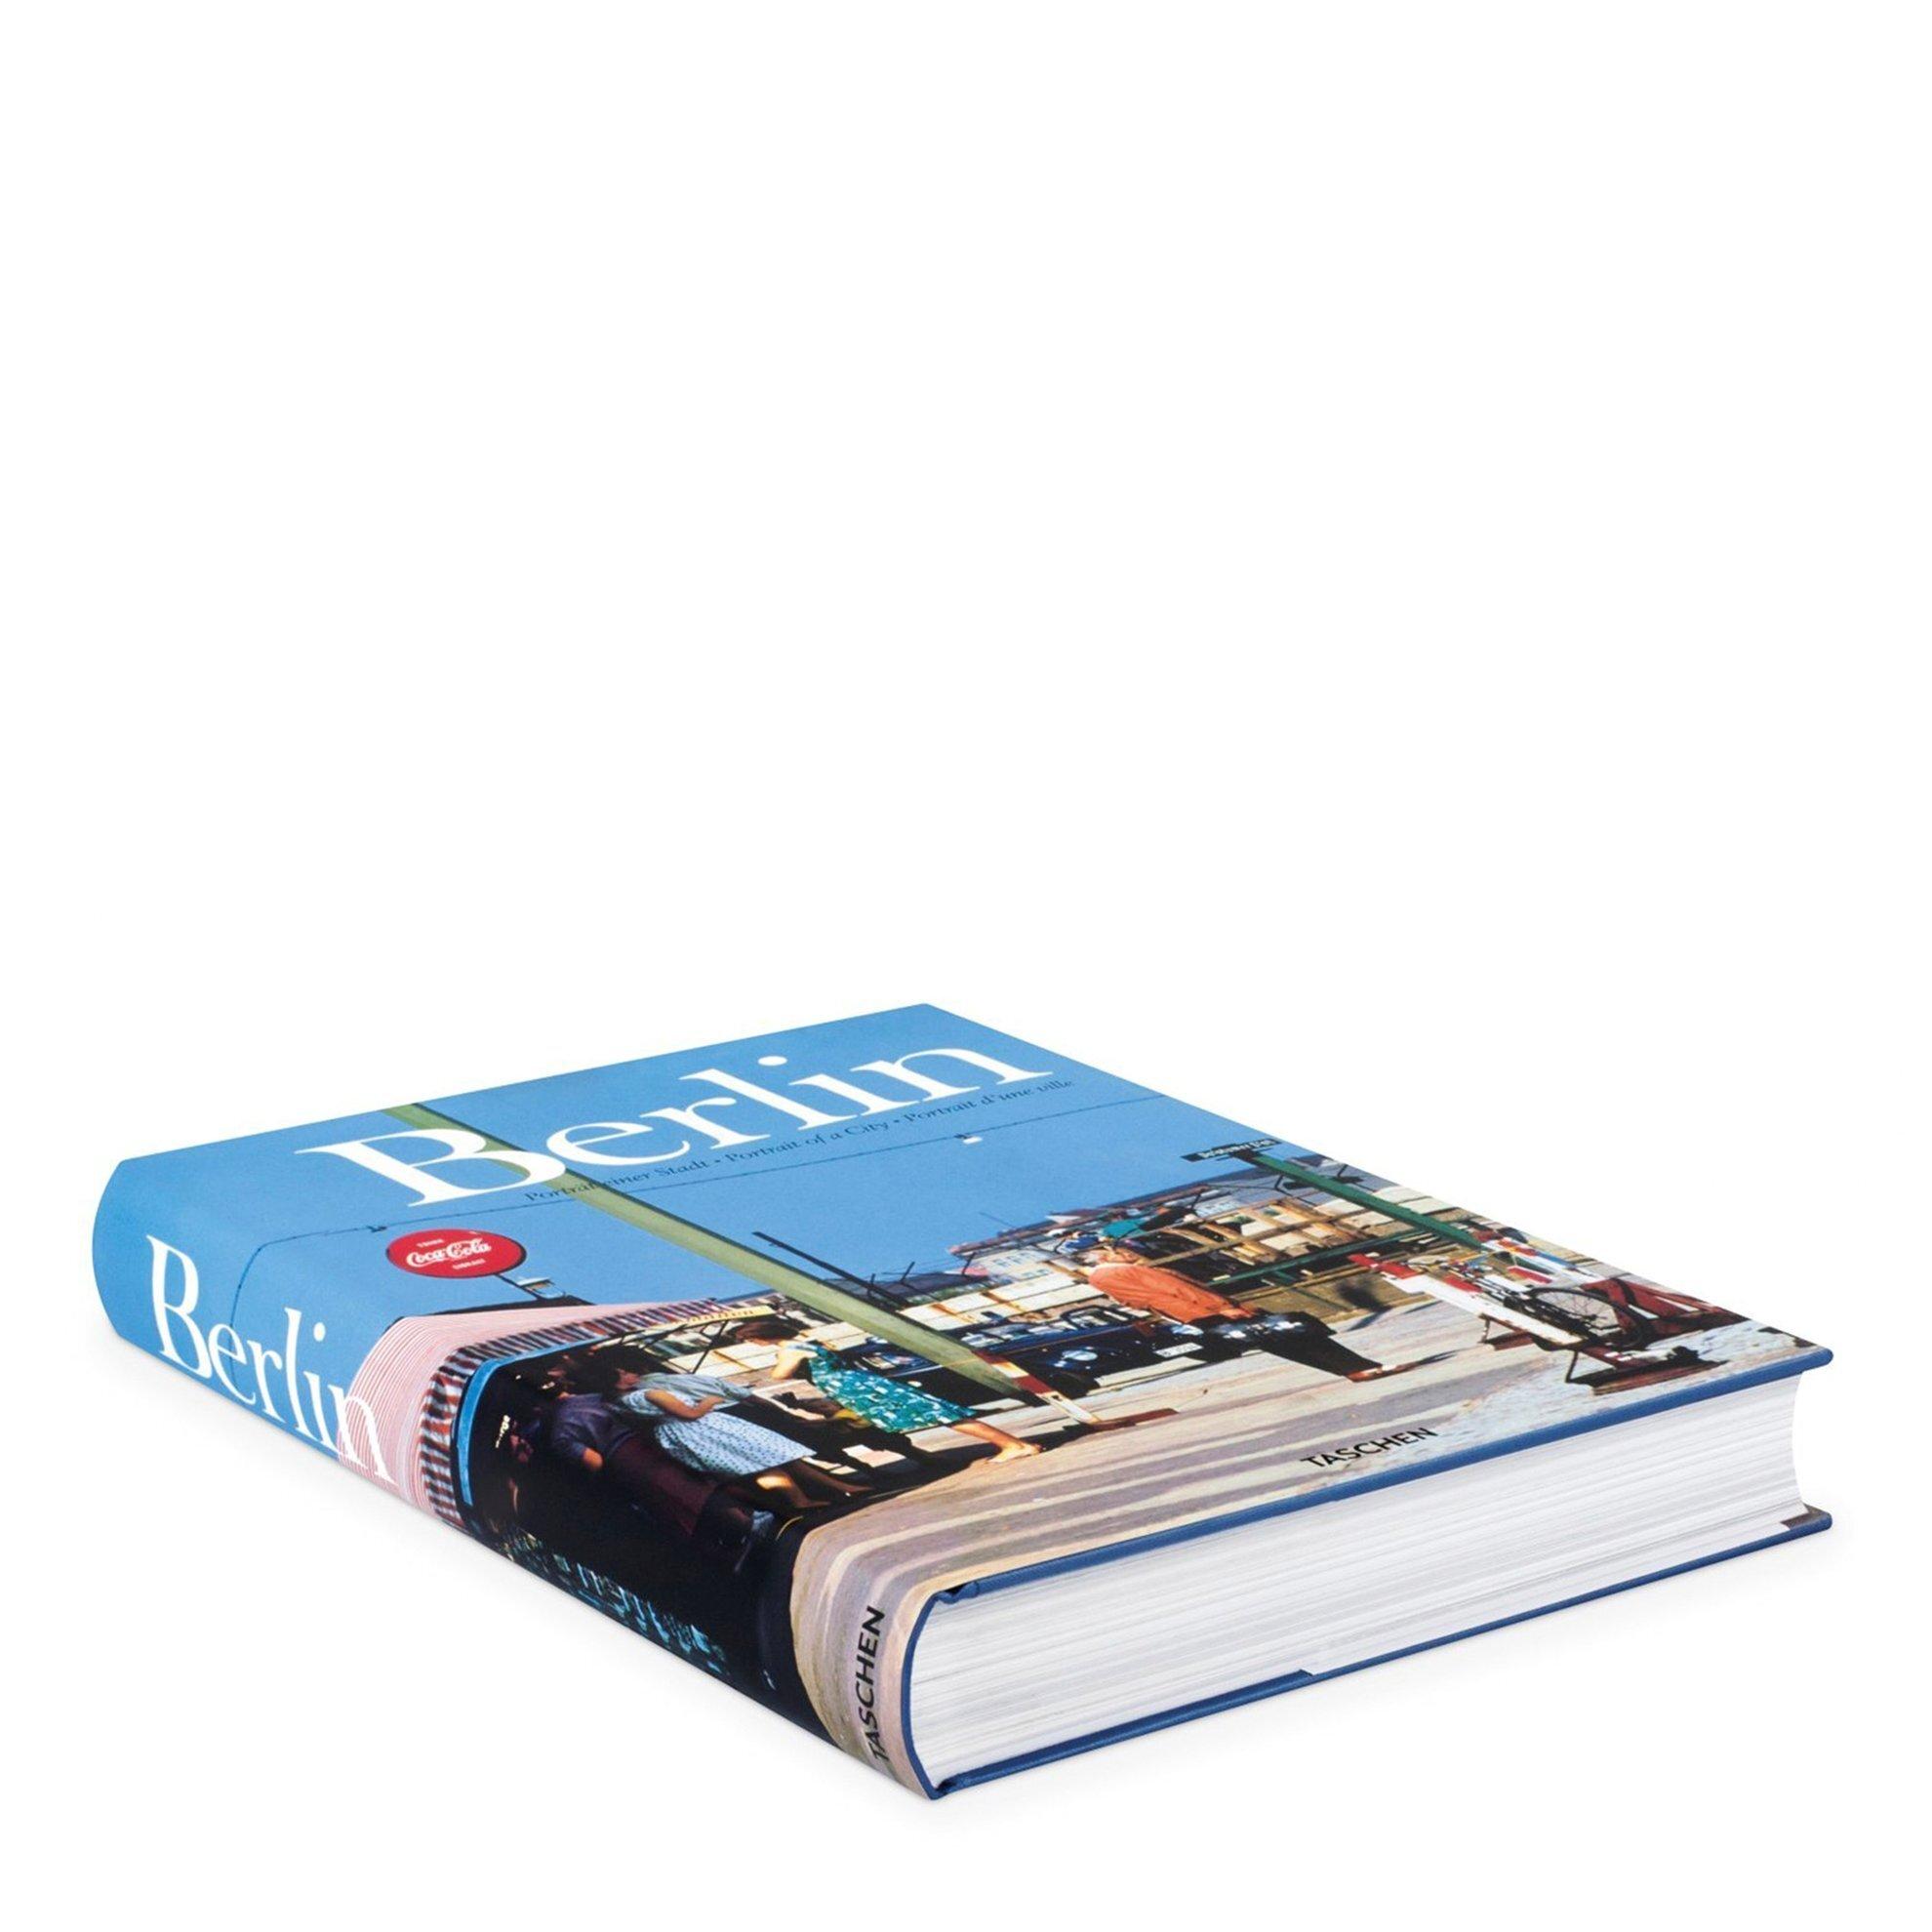 Kitap - Berlın, Potraıt Of A Cıty